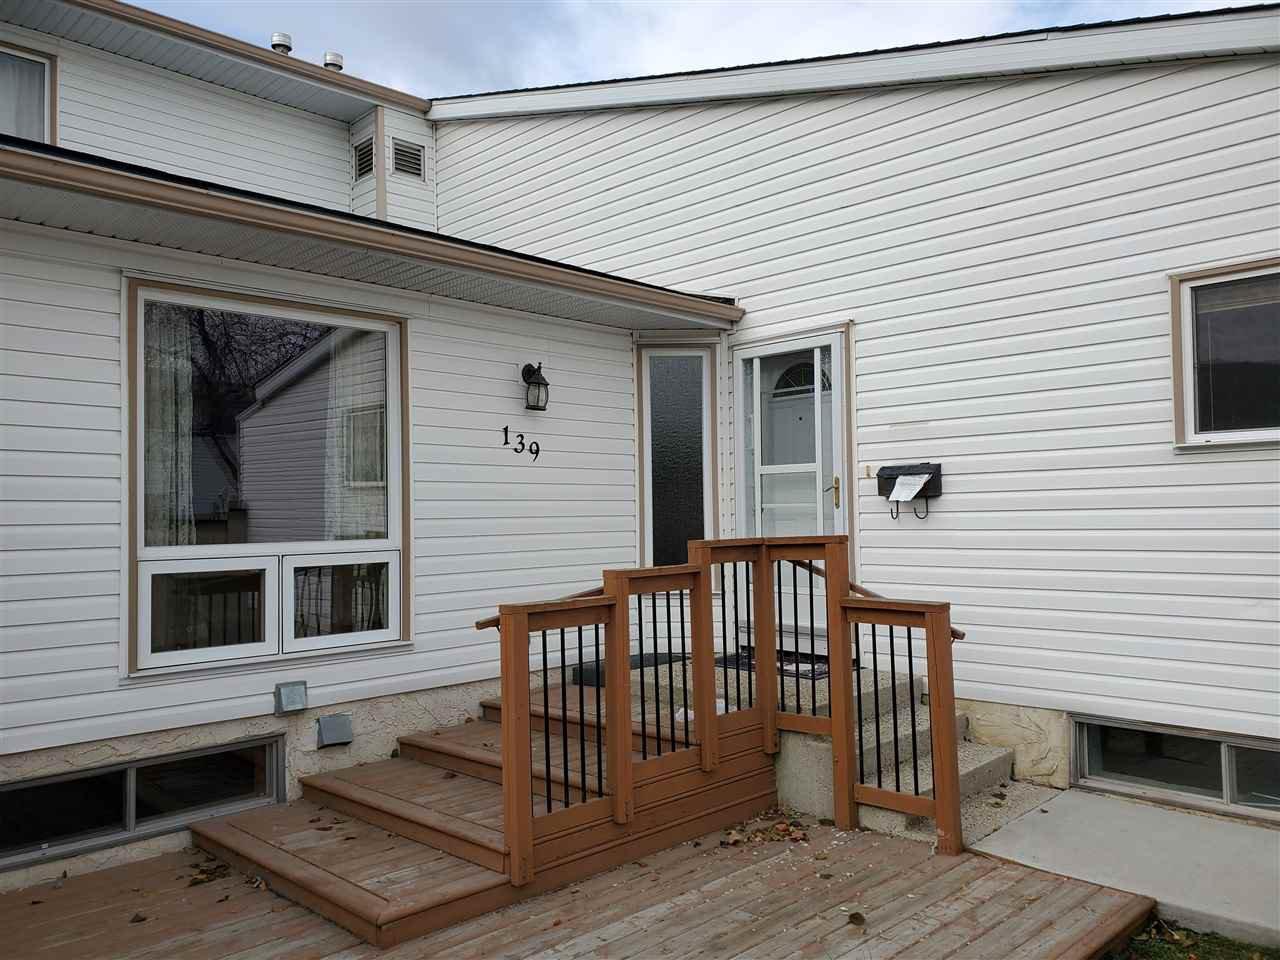 Main Photo: 139 MARLBOROUGH Place in Edmonton: Zone 20 Townhouse for sale : MLS®# E4178670